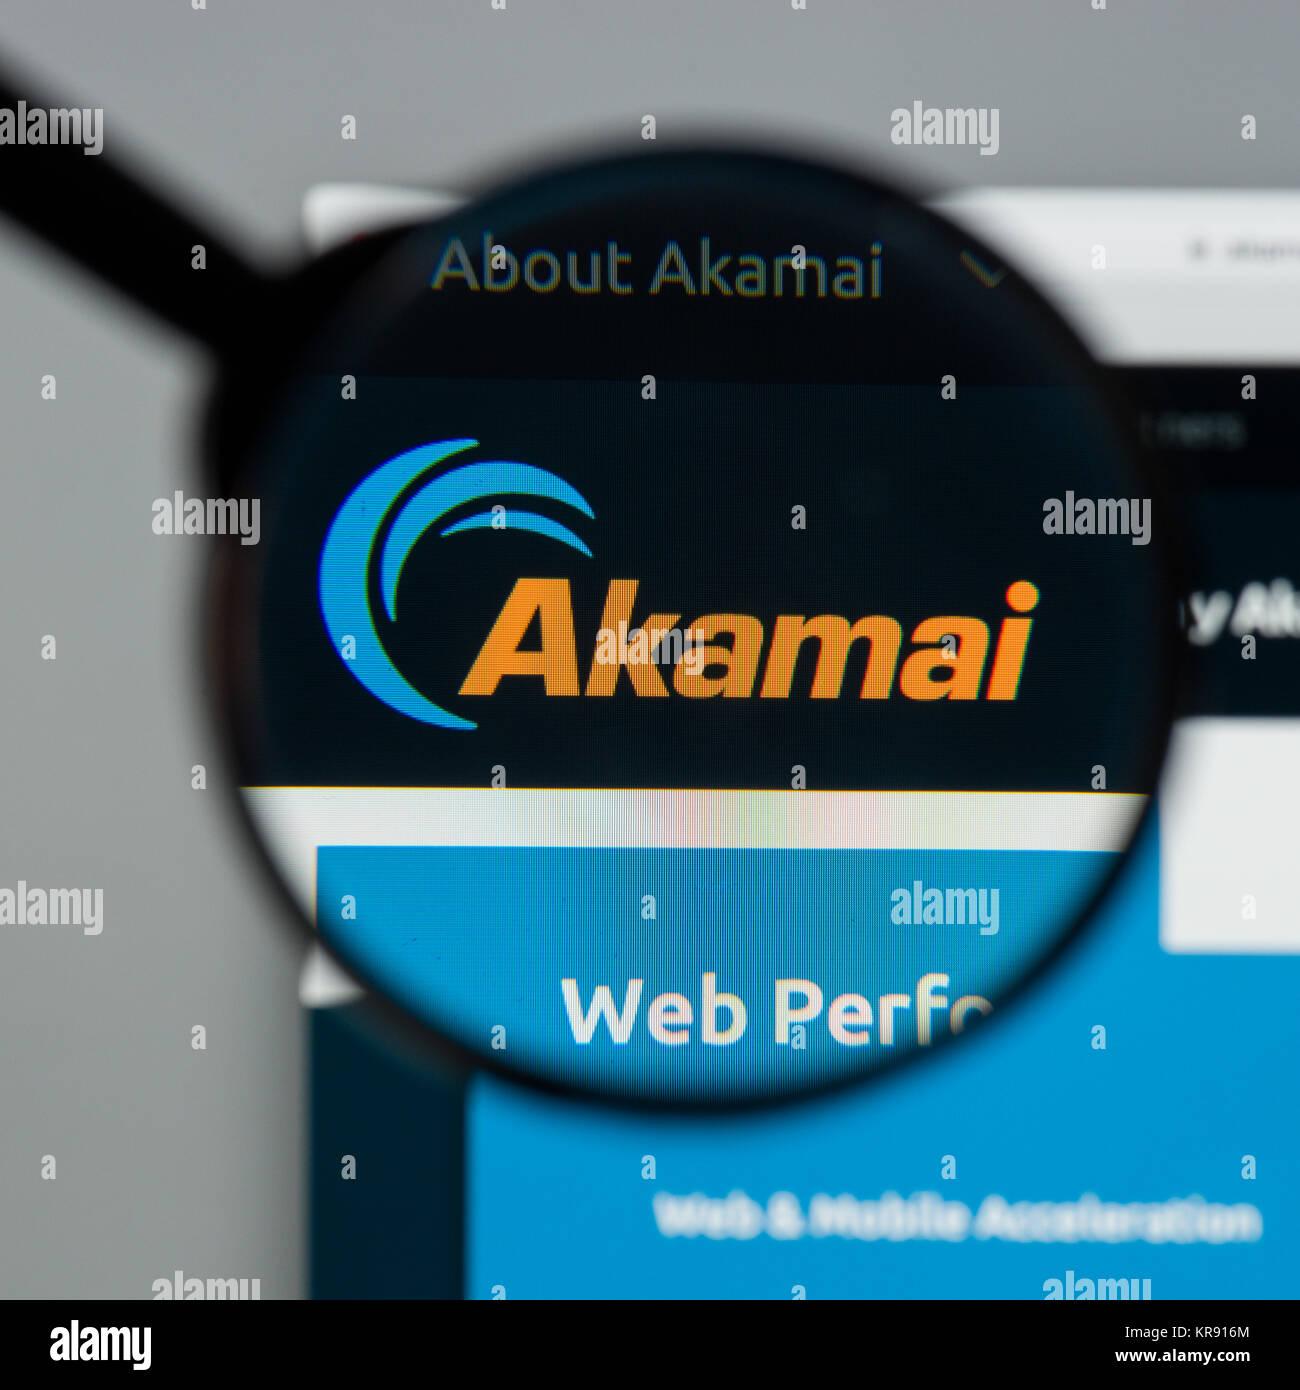 Milan Italy August 10 2017 Akamai Technologies Website Homepage